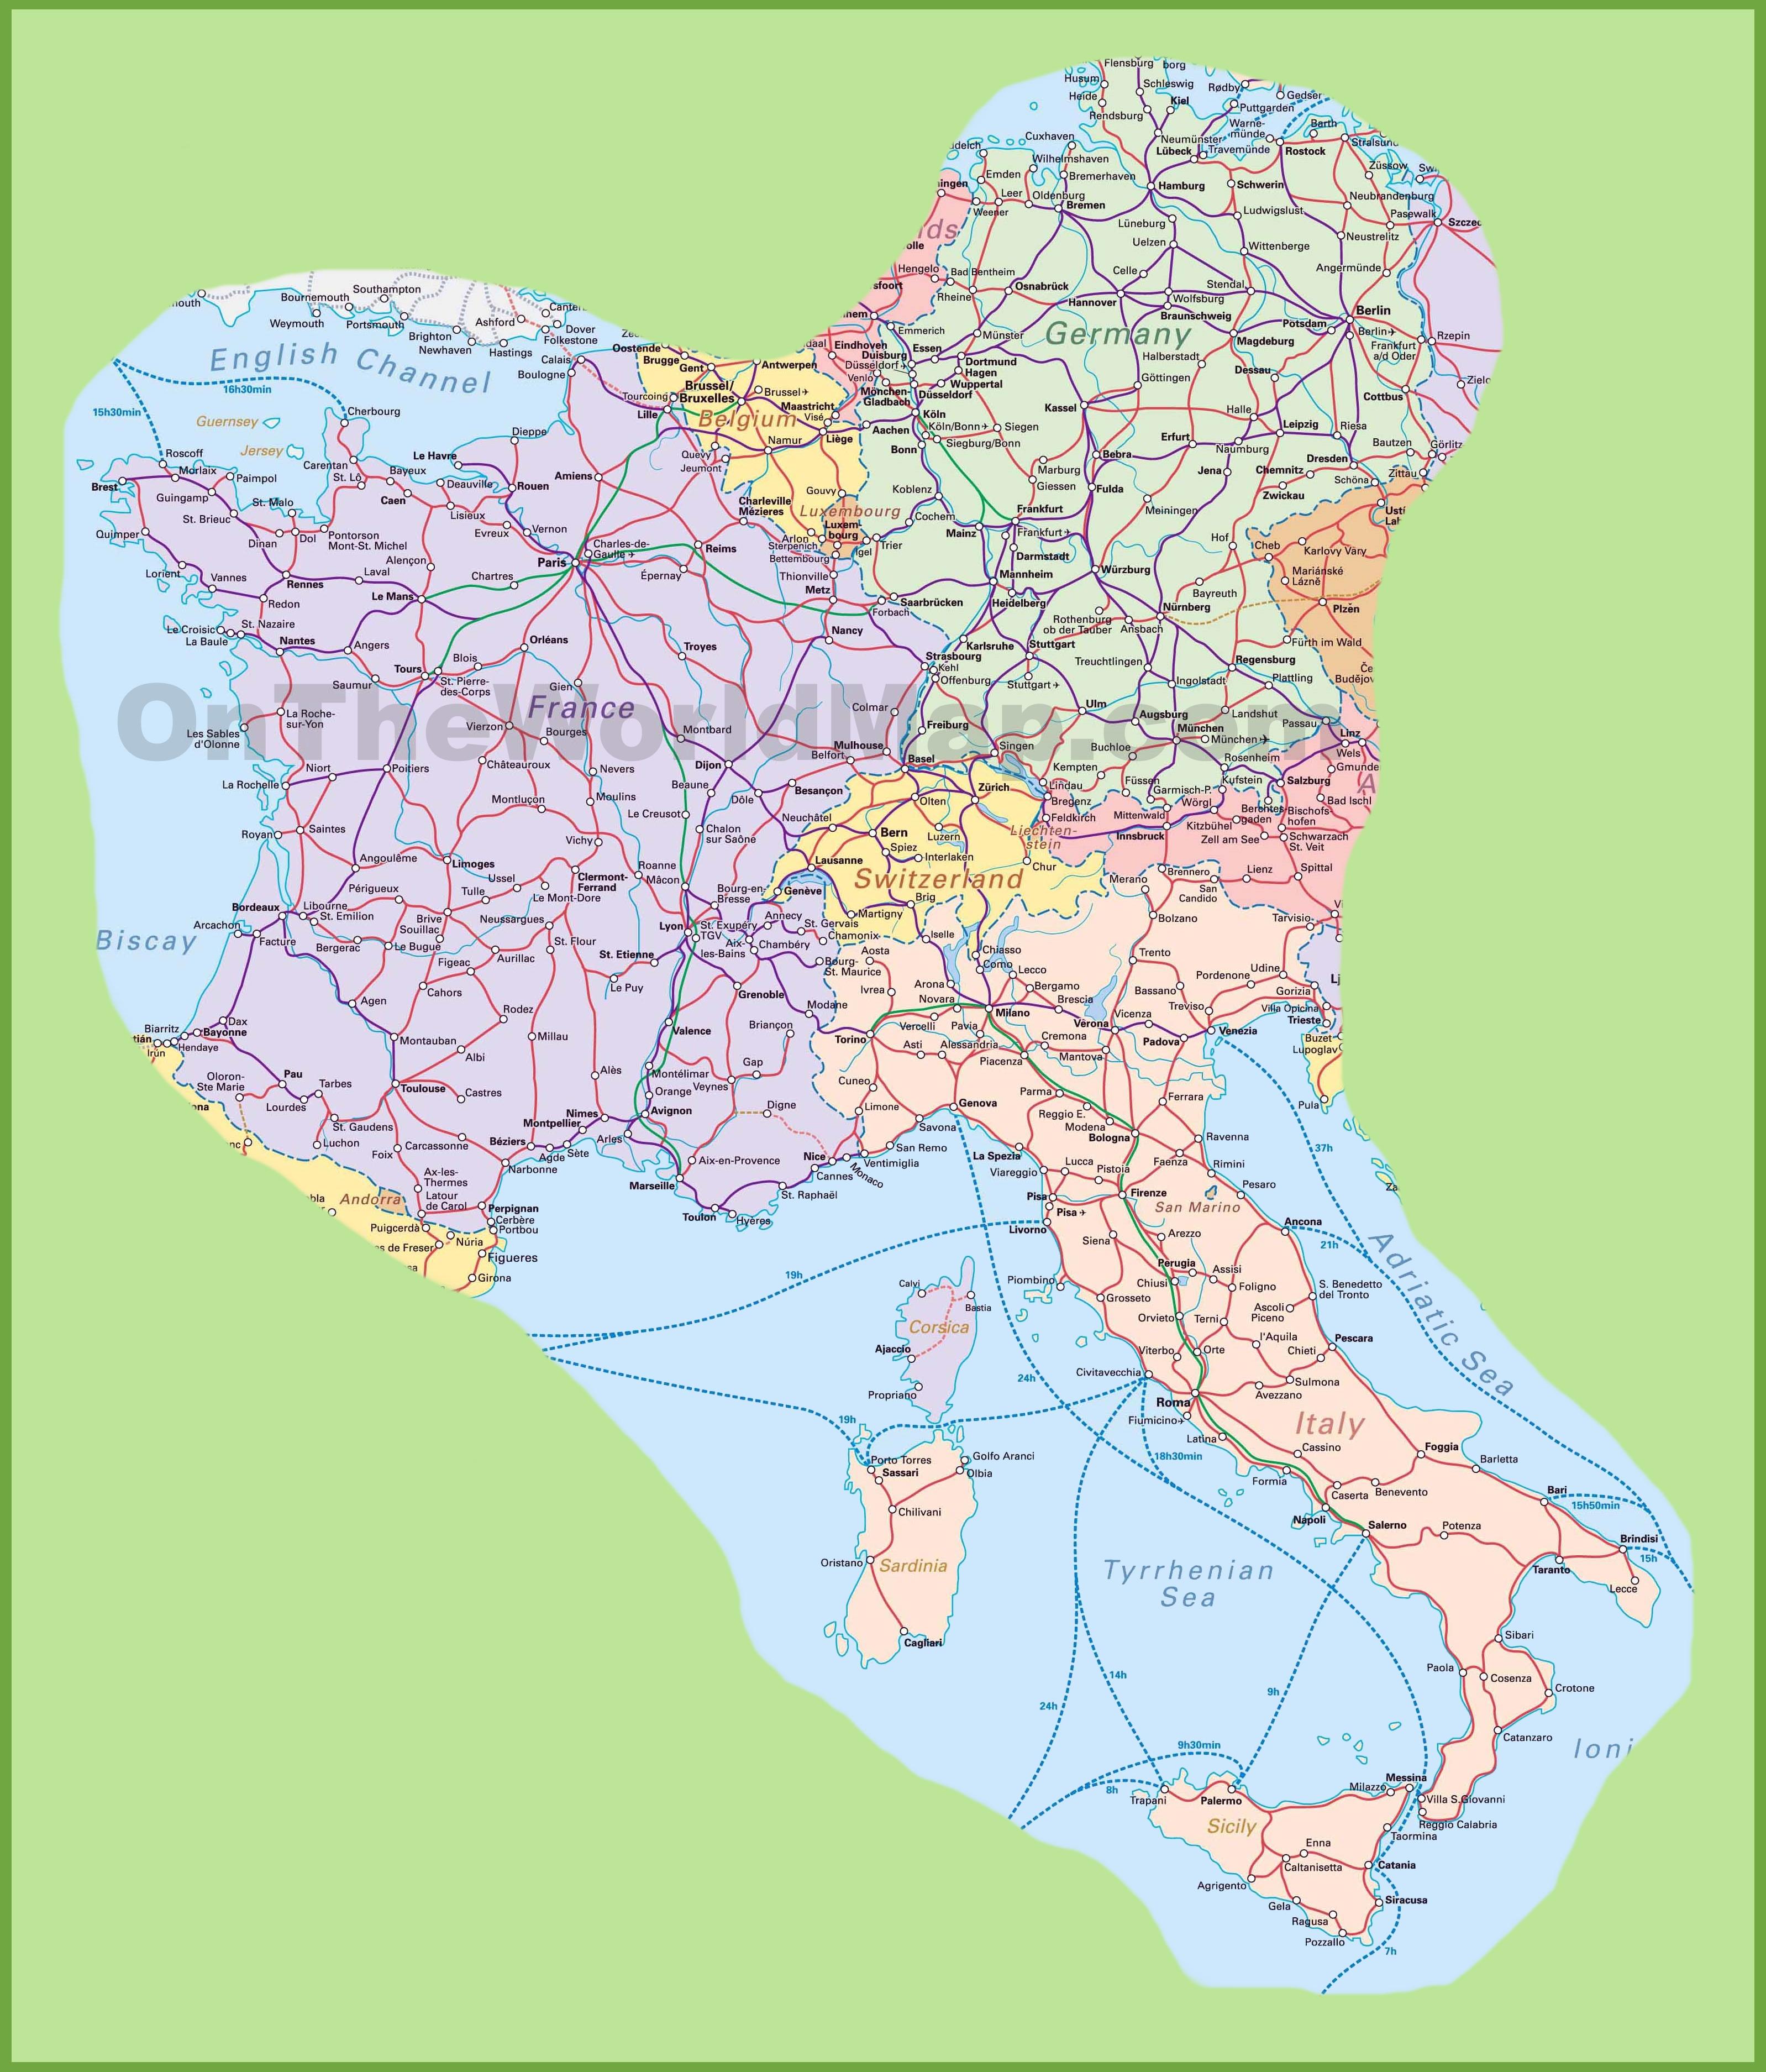 Maps To Print Swerc - Madrid Germanyıtalyspainfrancelondondenmarkmaptravel Travel